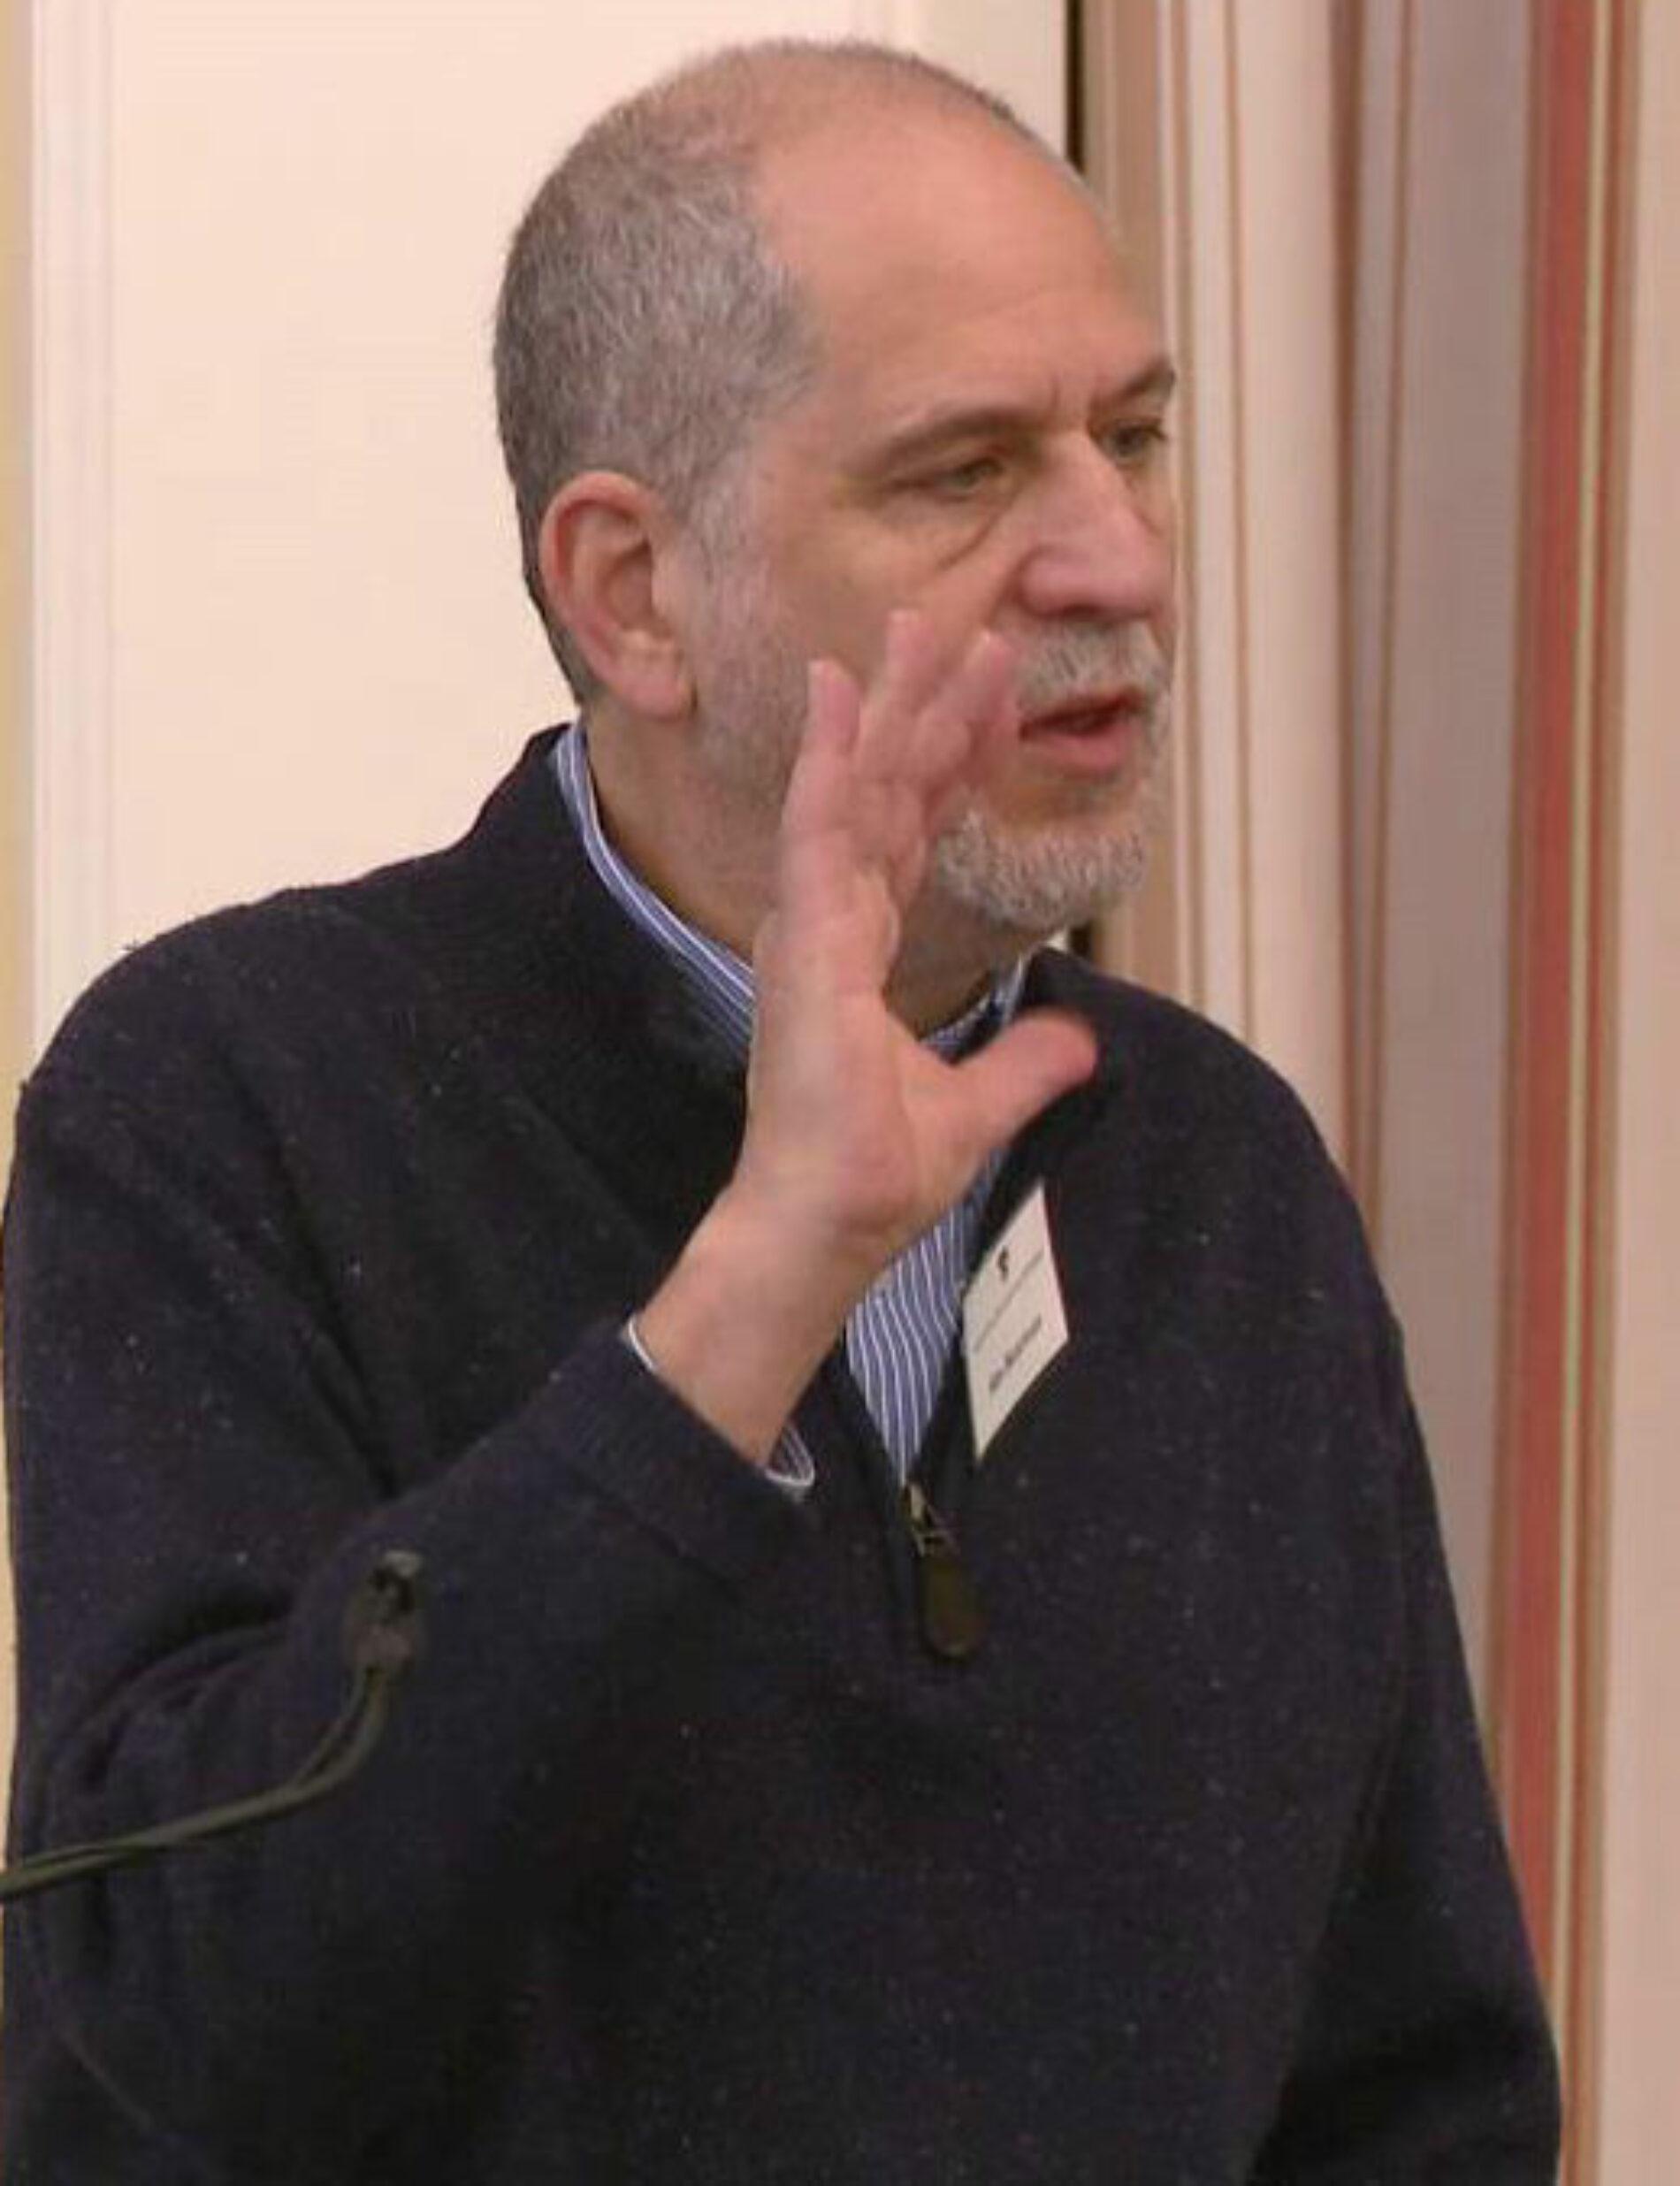 Макс Базерман: Когда переговорщики ведут себя как паразиты